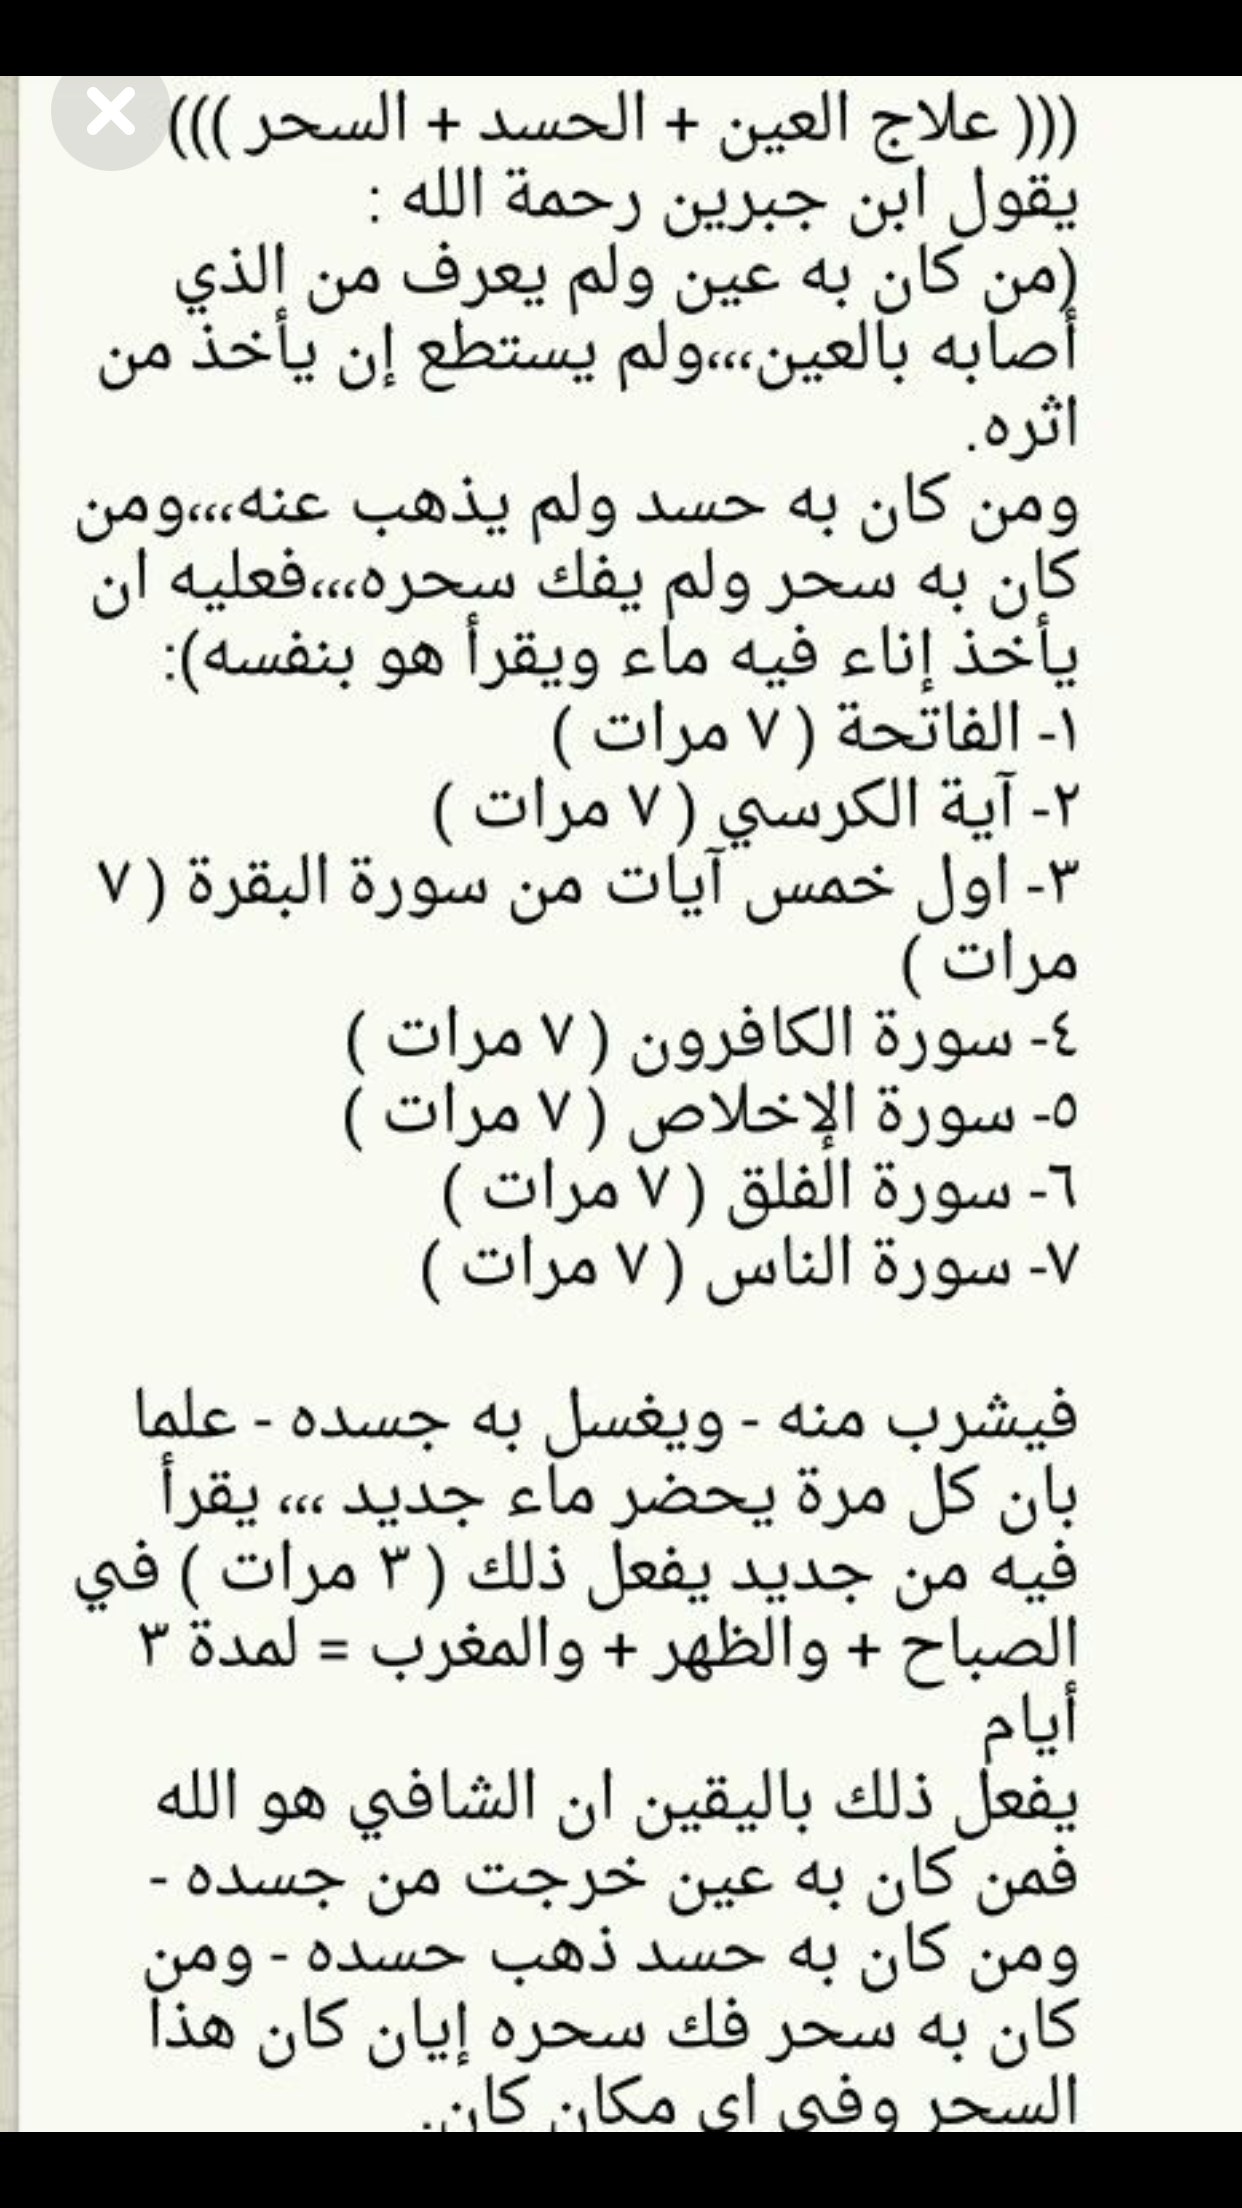 Pin By Dana On اذكارات Islam Beliefs Islamic Phrases Islam Facts